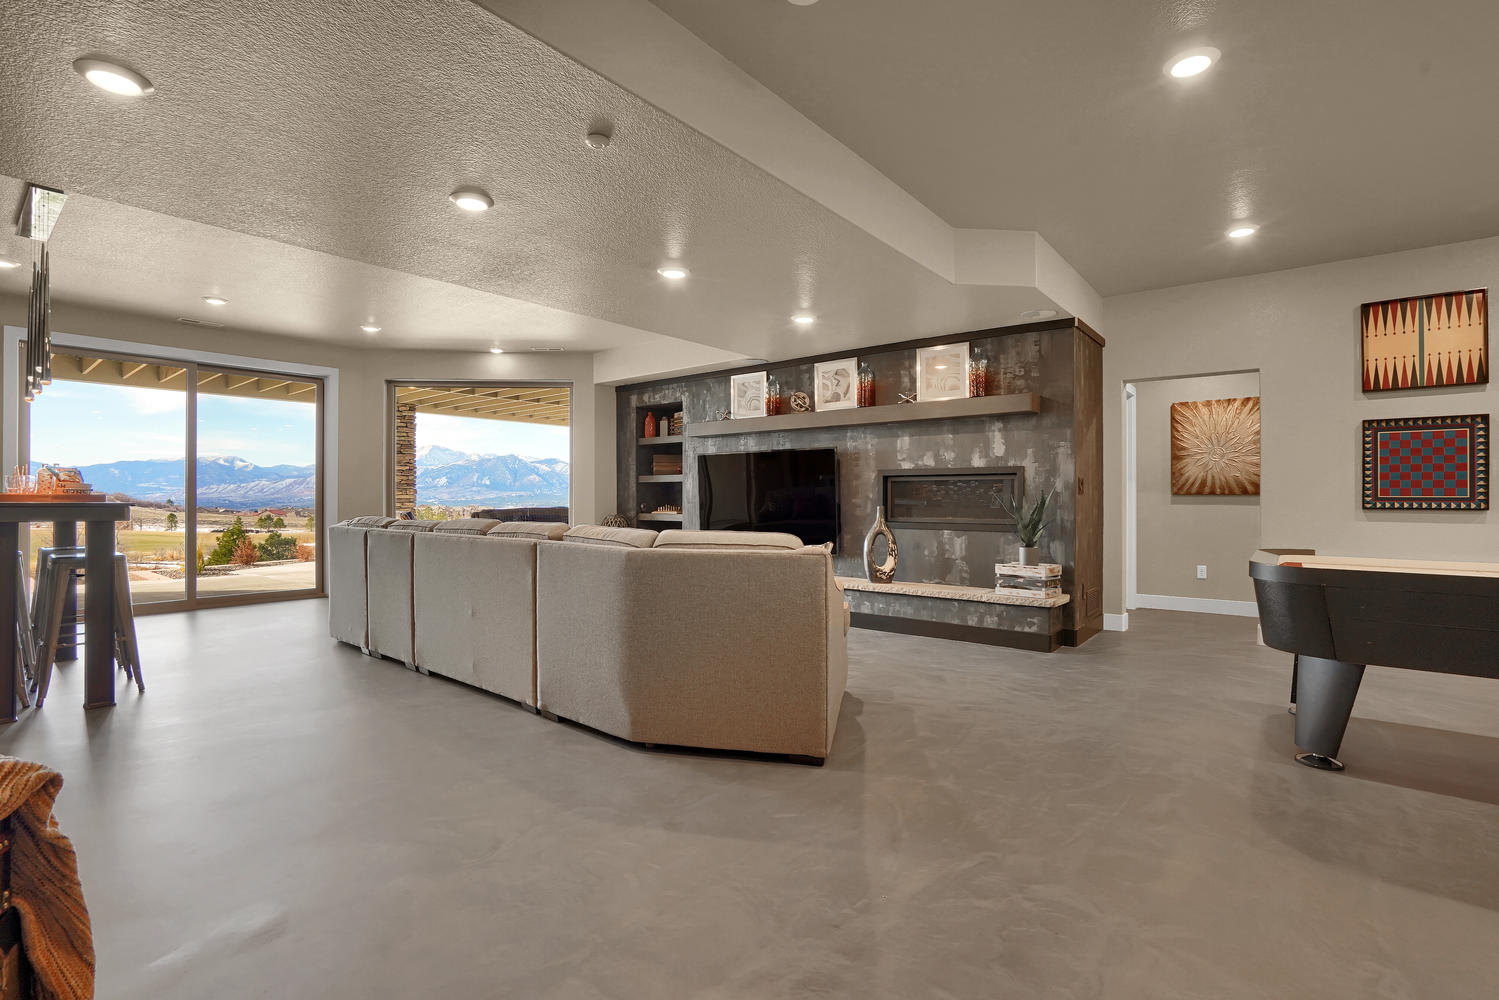 1807 Redbank Dr Colorado-large-033-34-Recreation Room-1499x1000-72dpi.jpg